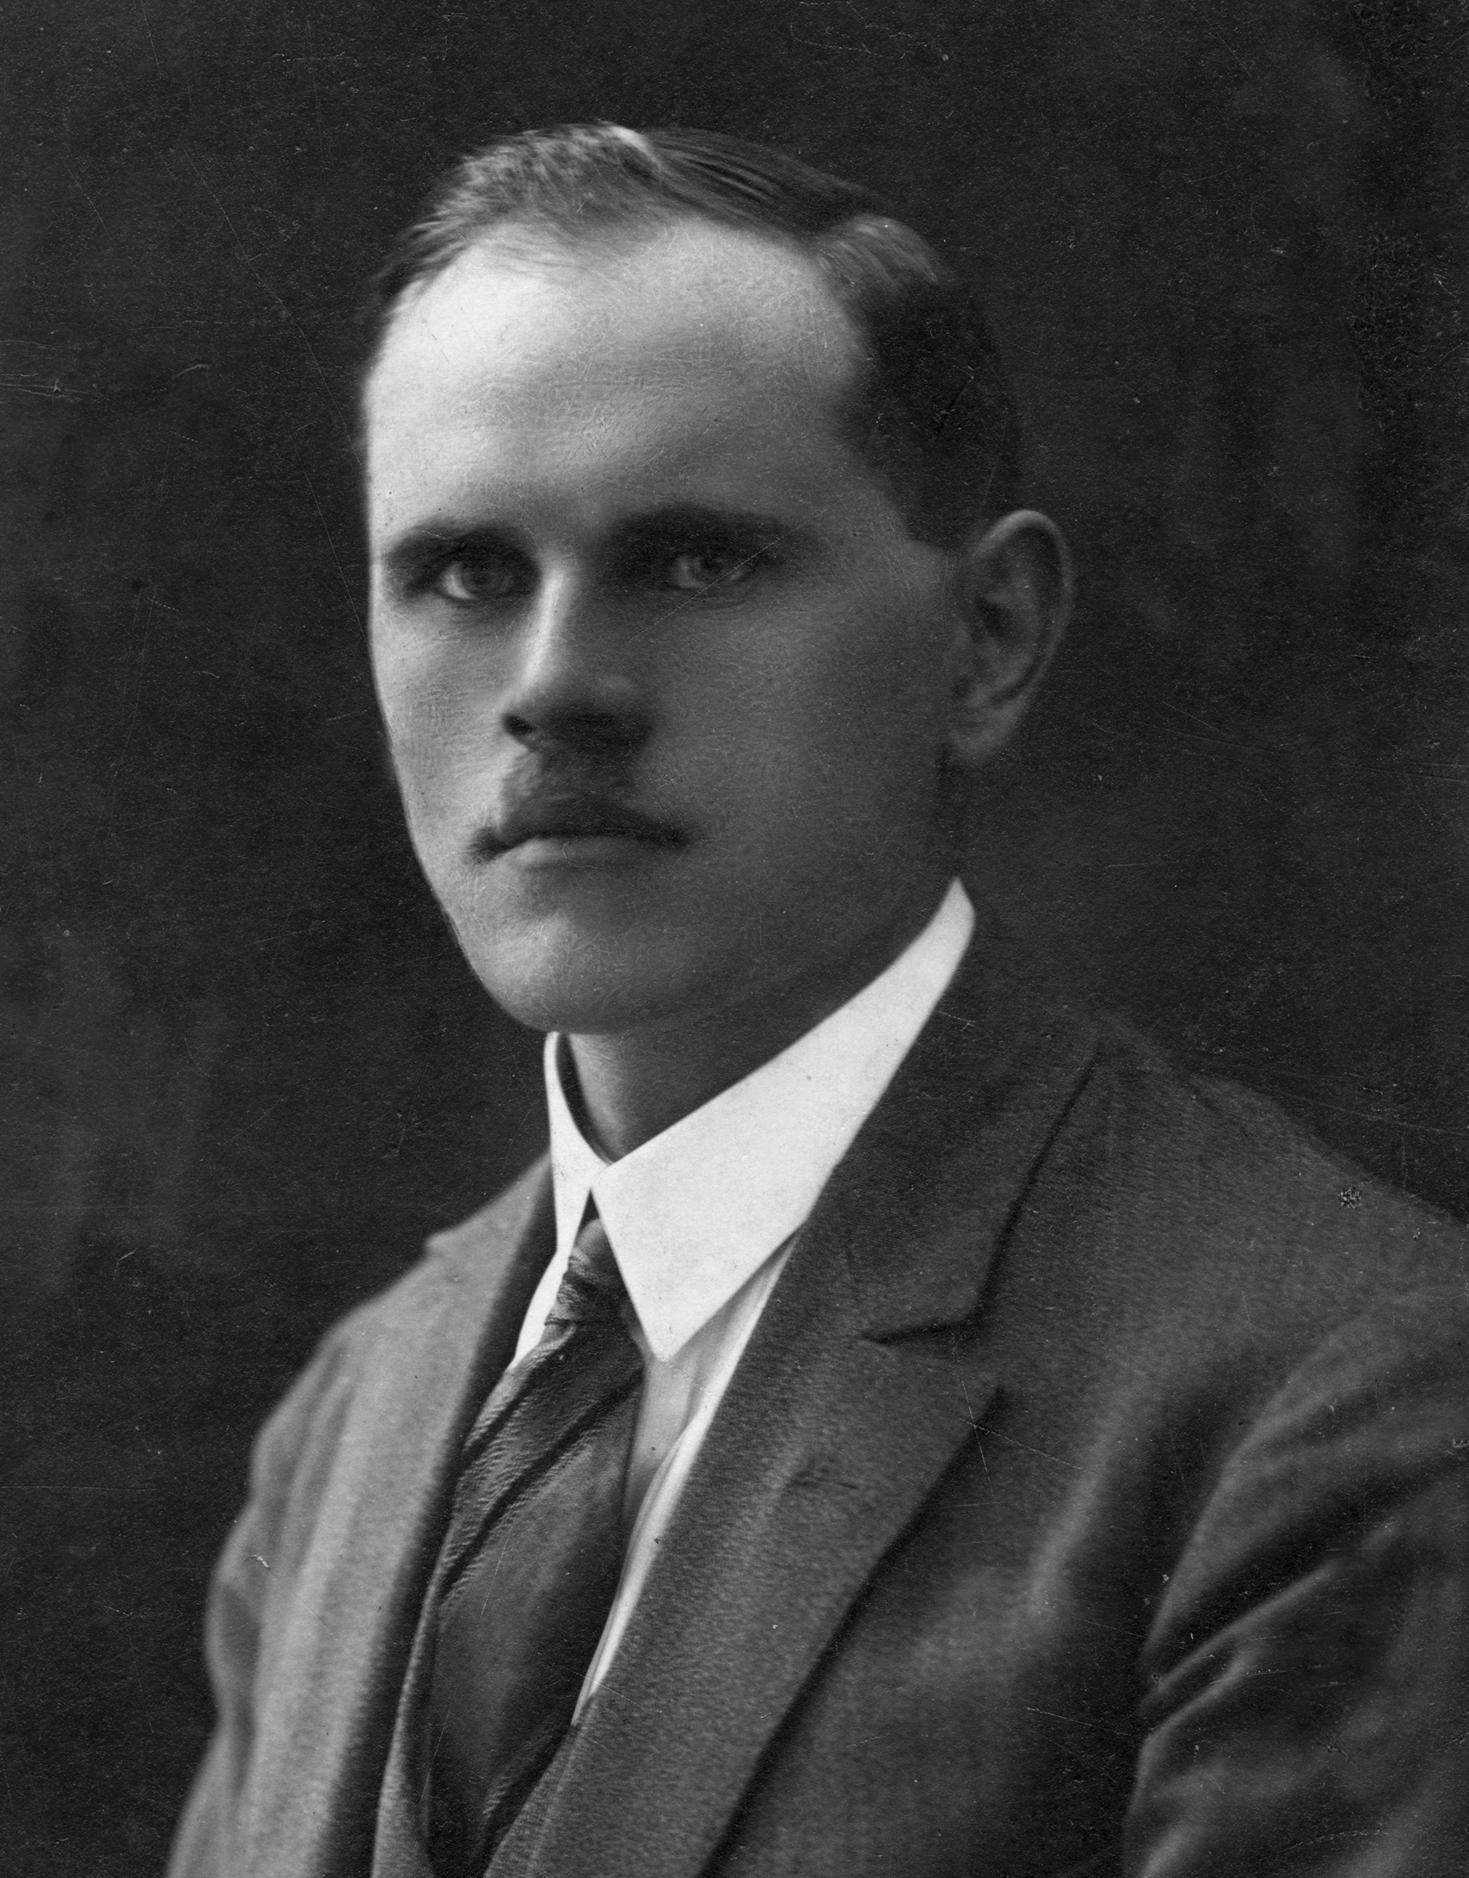 https://www.jmuseum.lt/uploads/userfiles/zuvanciuju_gelbejimo_kryziaus/1928-05-20_Antanas-Blažaitis_Kalvarija.jpg